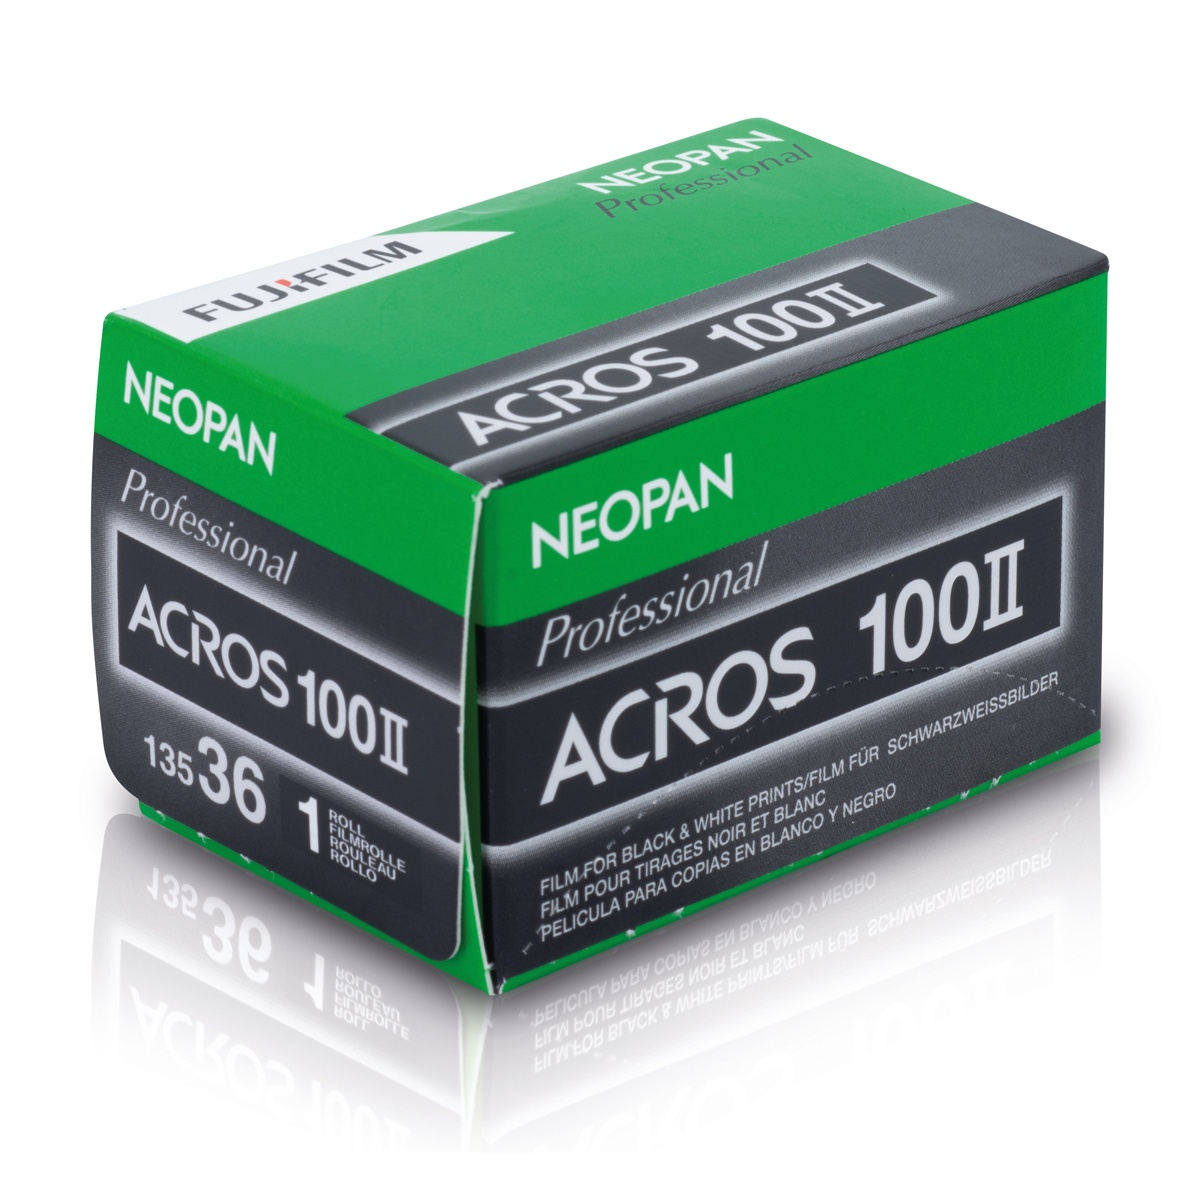 Fujifilm Neopan Acros II 100 36 Kleinbildfilm SW